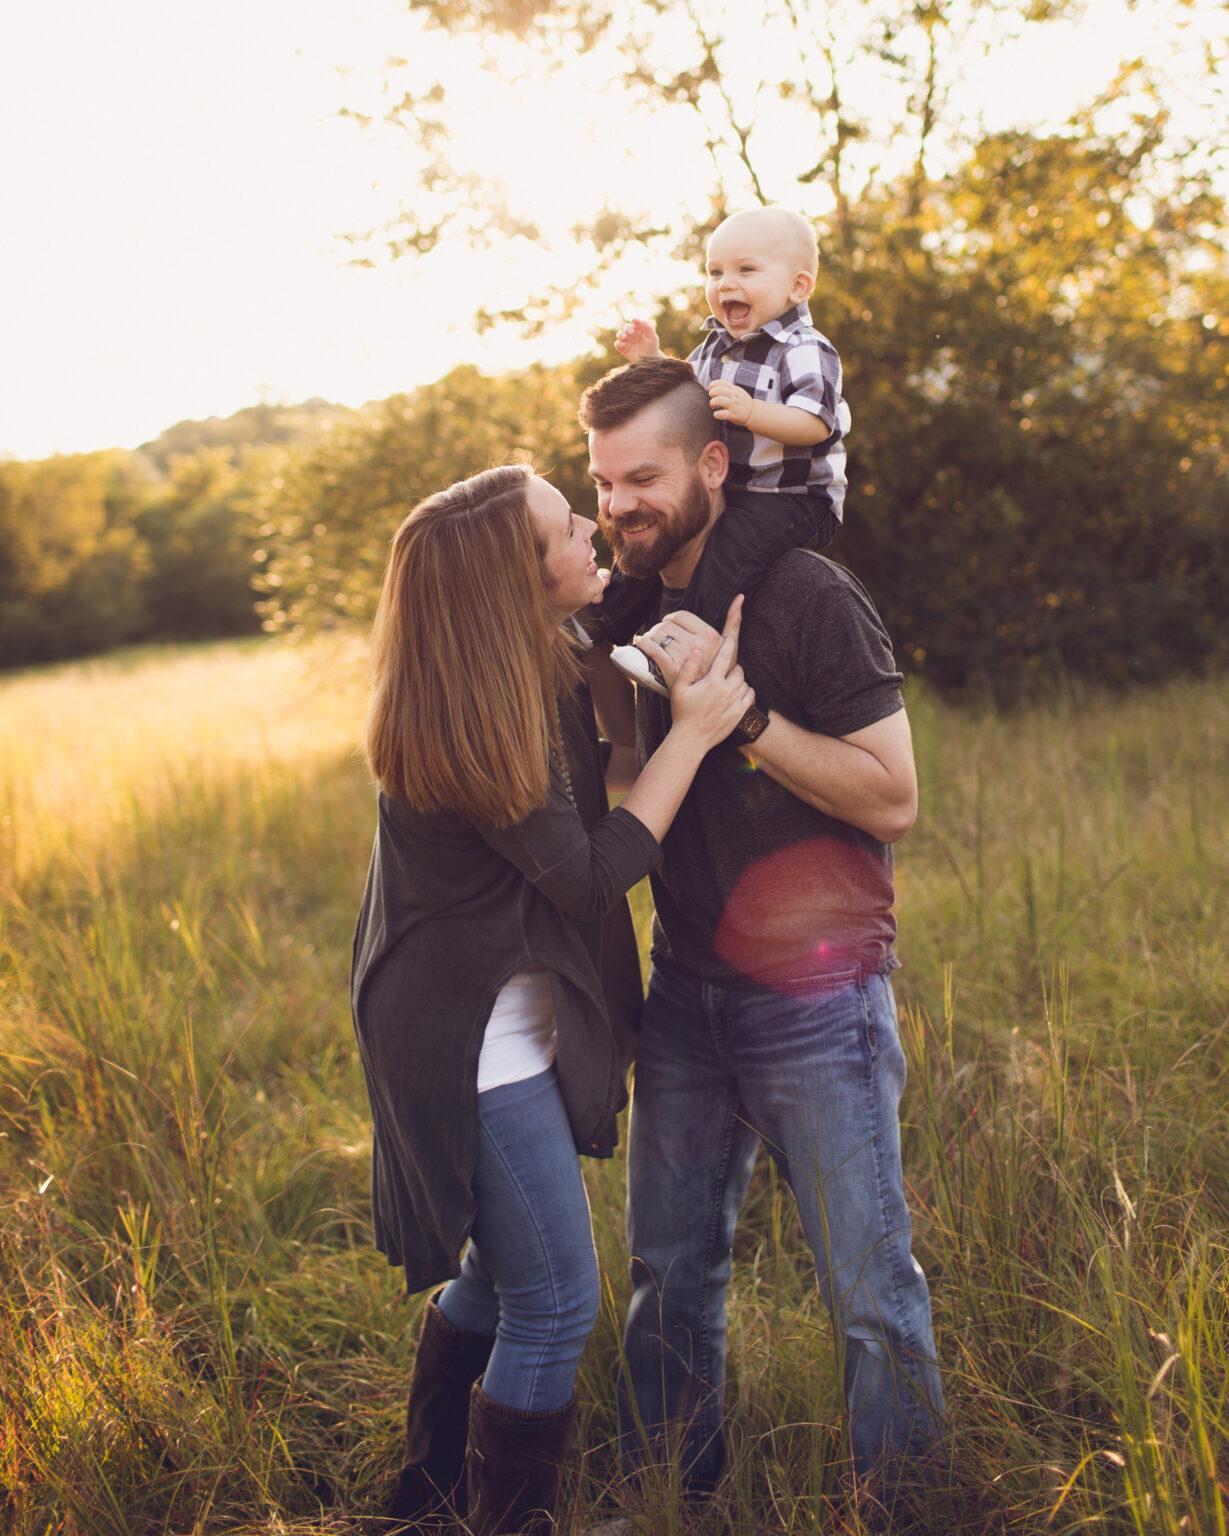 Phillip Sanford and Family